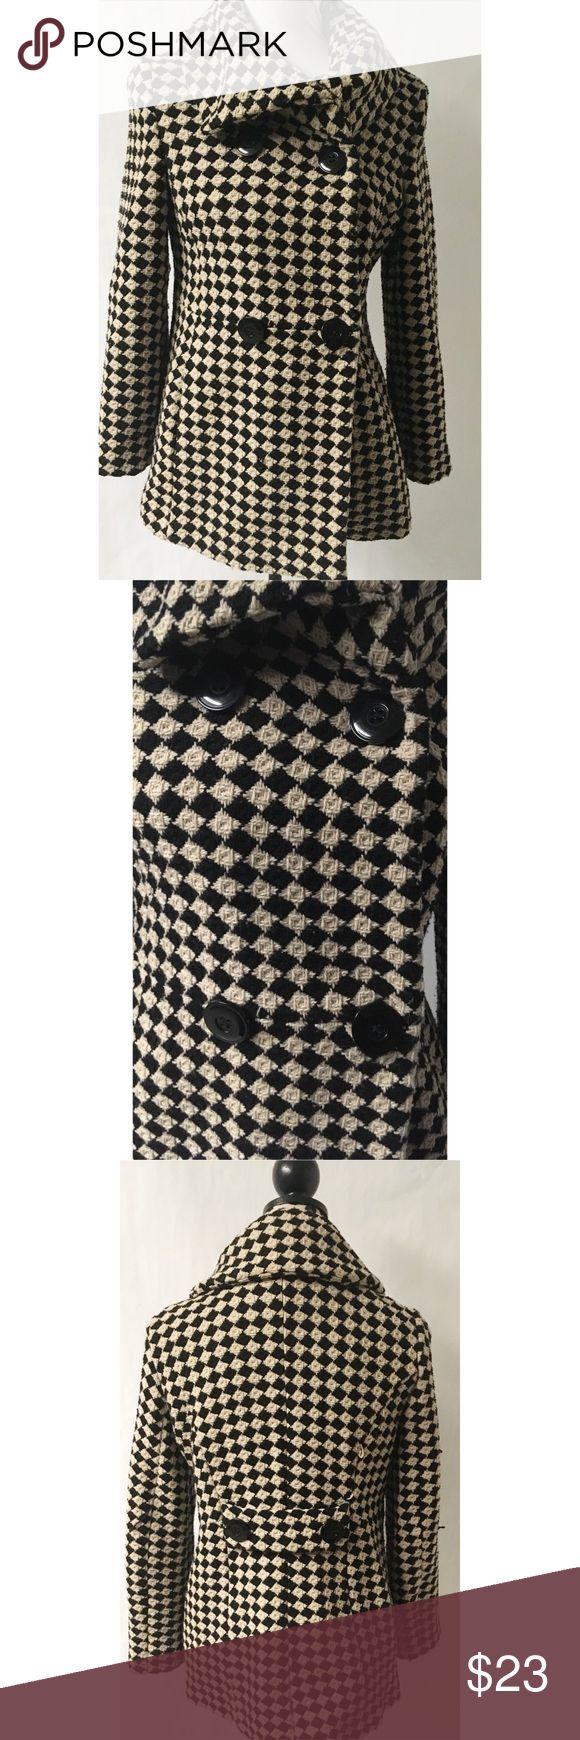 Tan & Black Pea Coat Size Petite Medium Length 28 Bust 38 debenhams Jackets & Coats Pea Coats